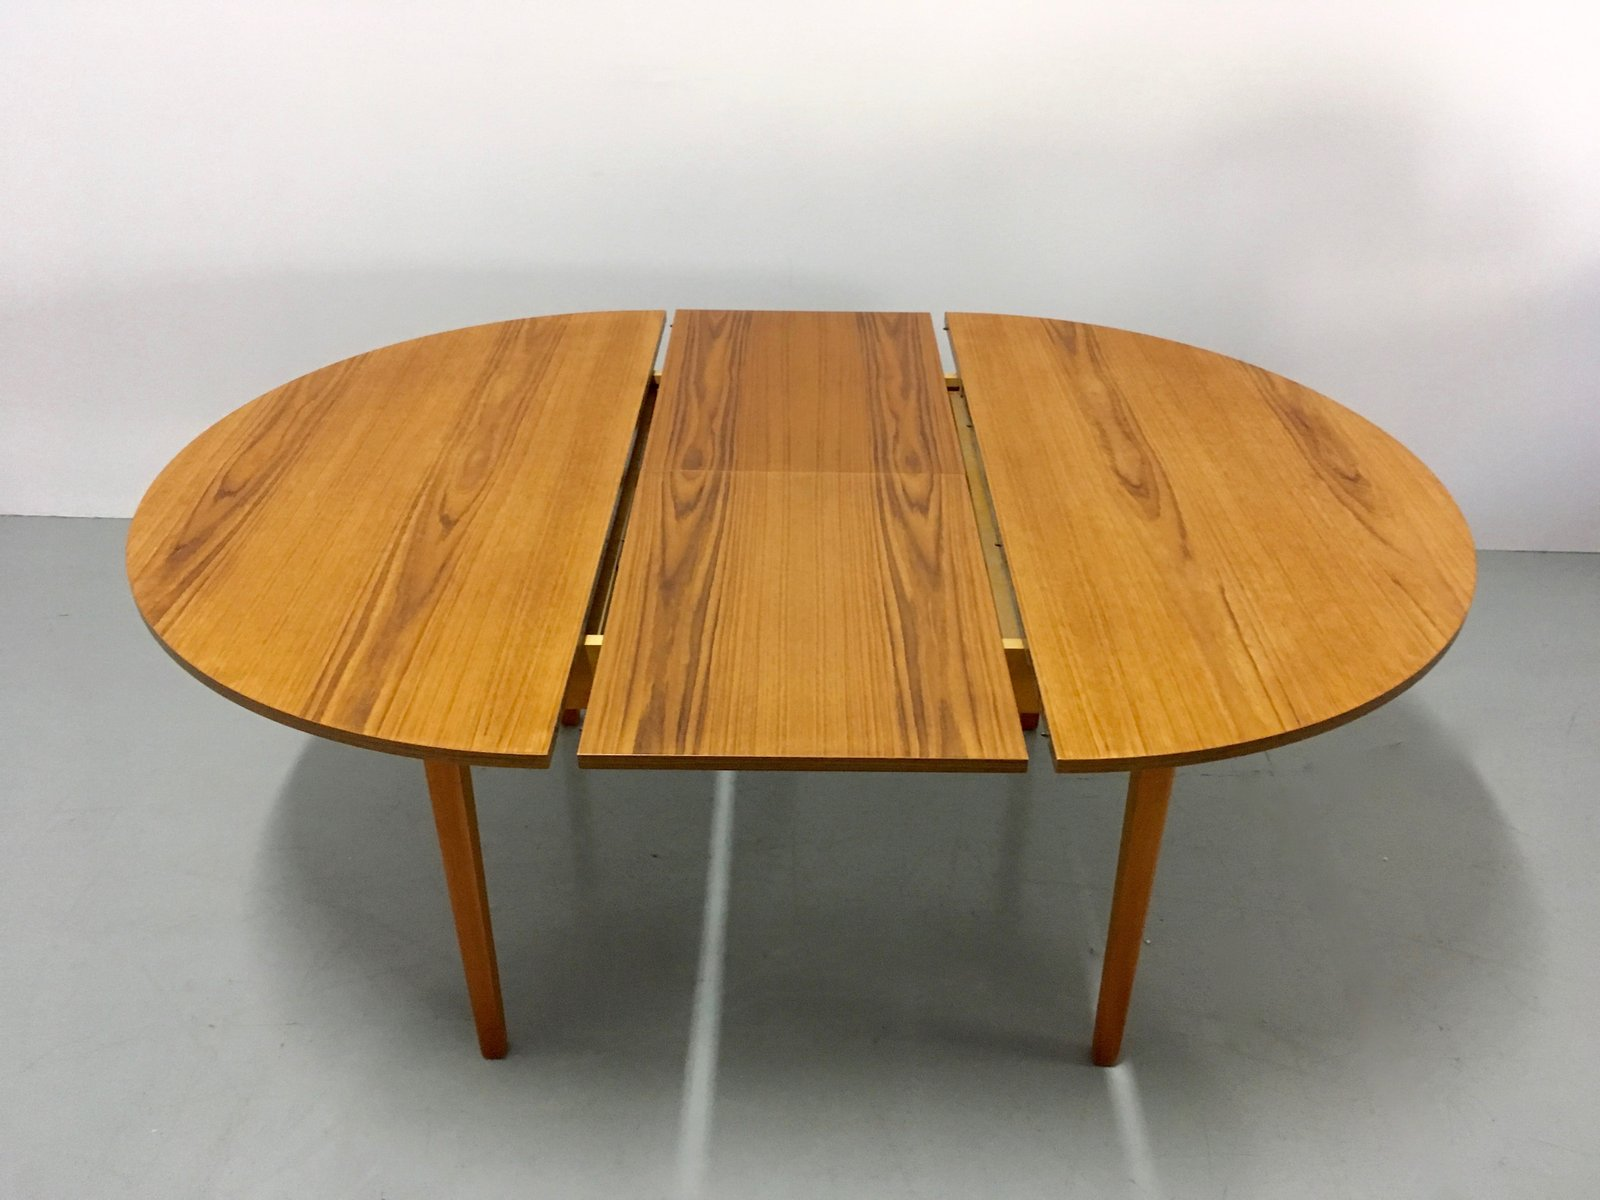 Vintage Danish Extendable Teak Dining Table 1960s For